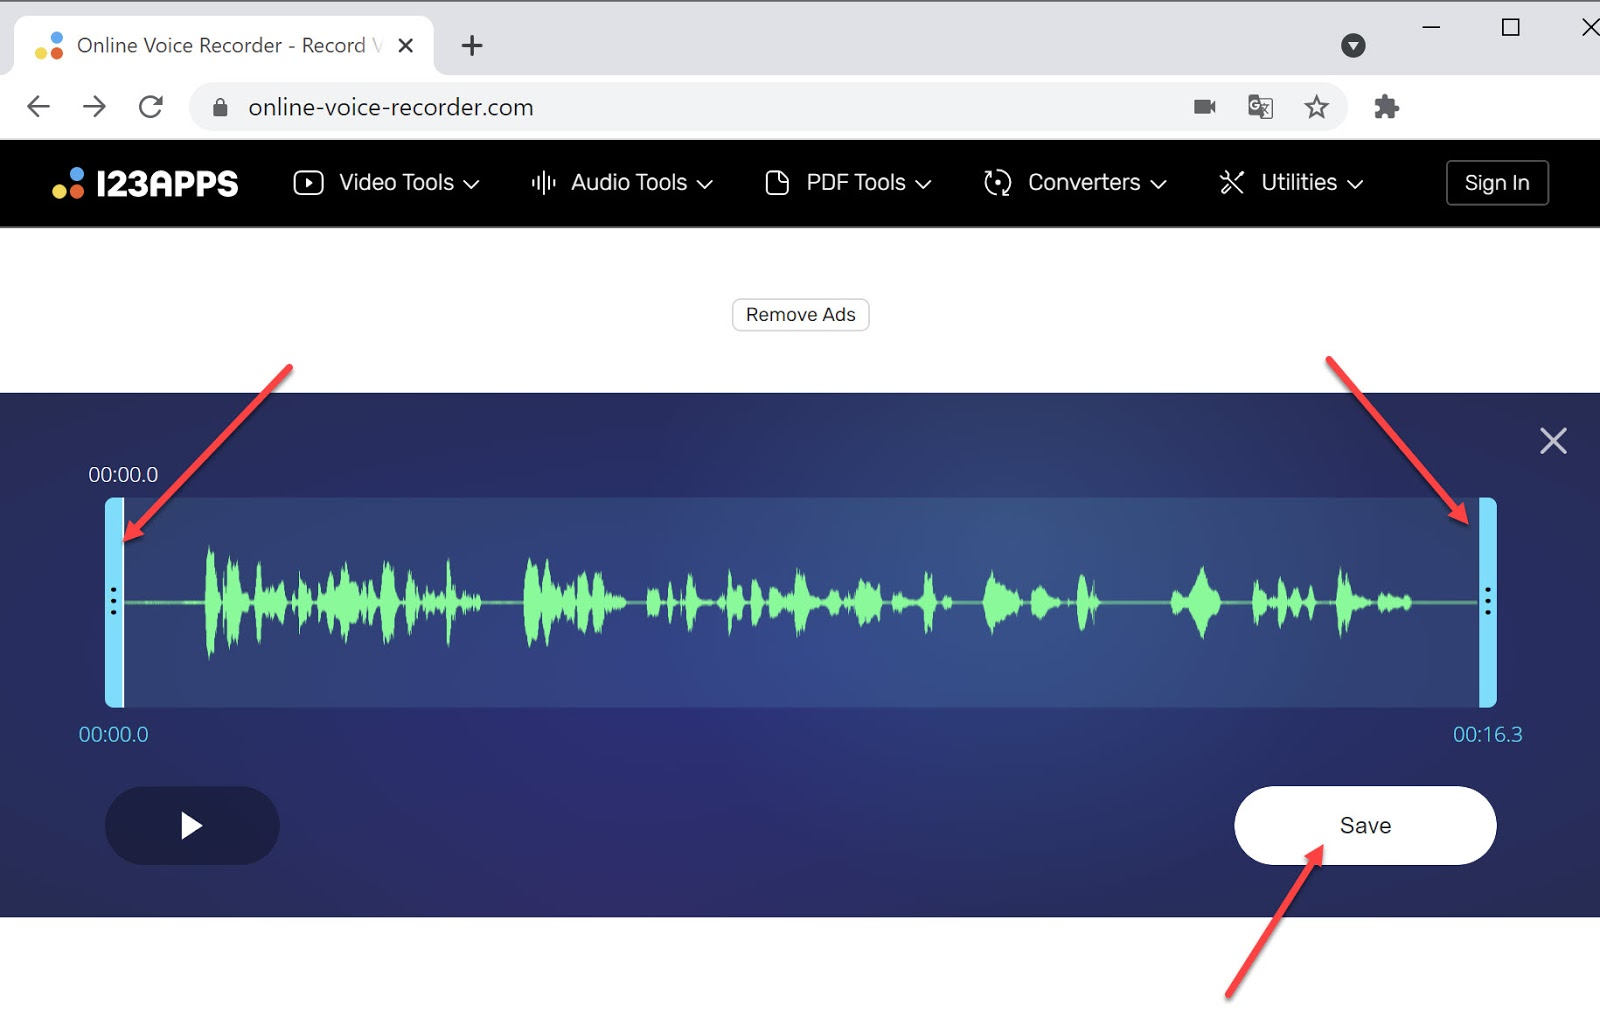 Screenshot of Online Voice Recorder audio editing capabilities